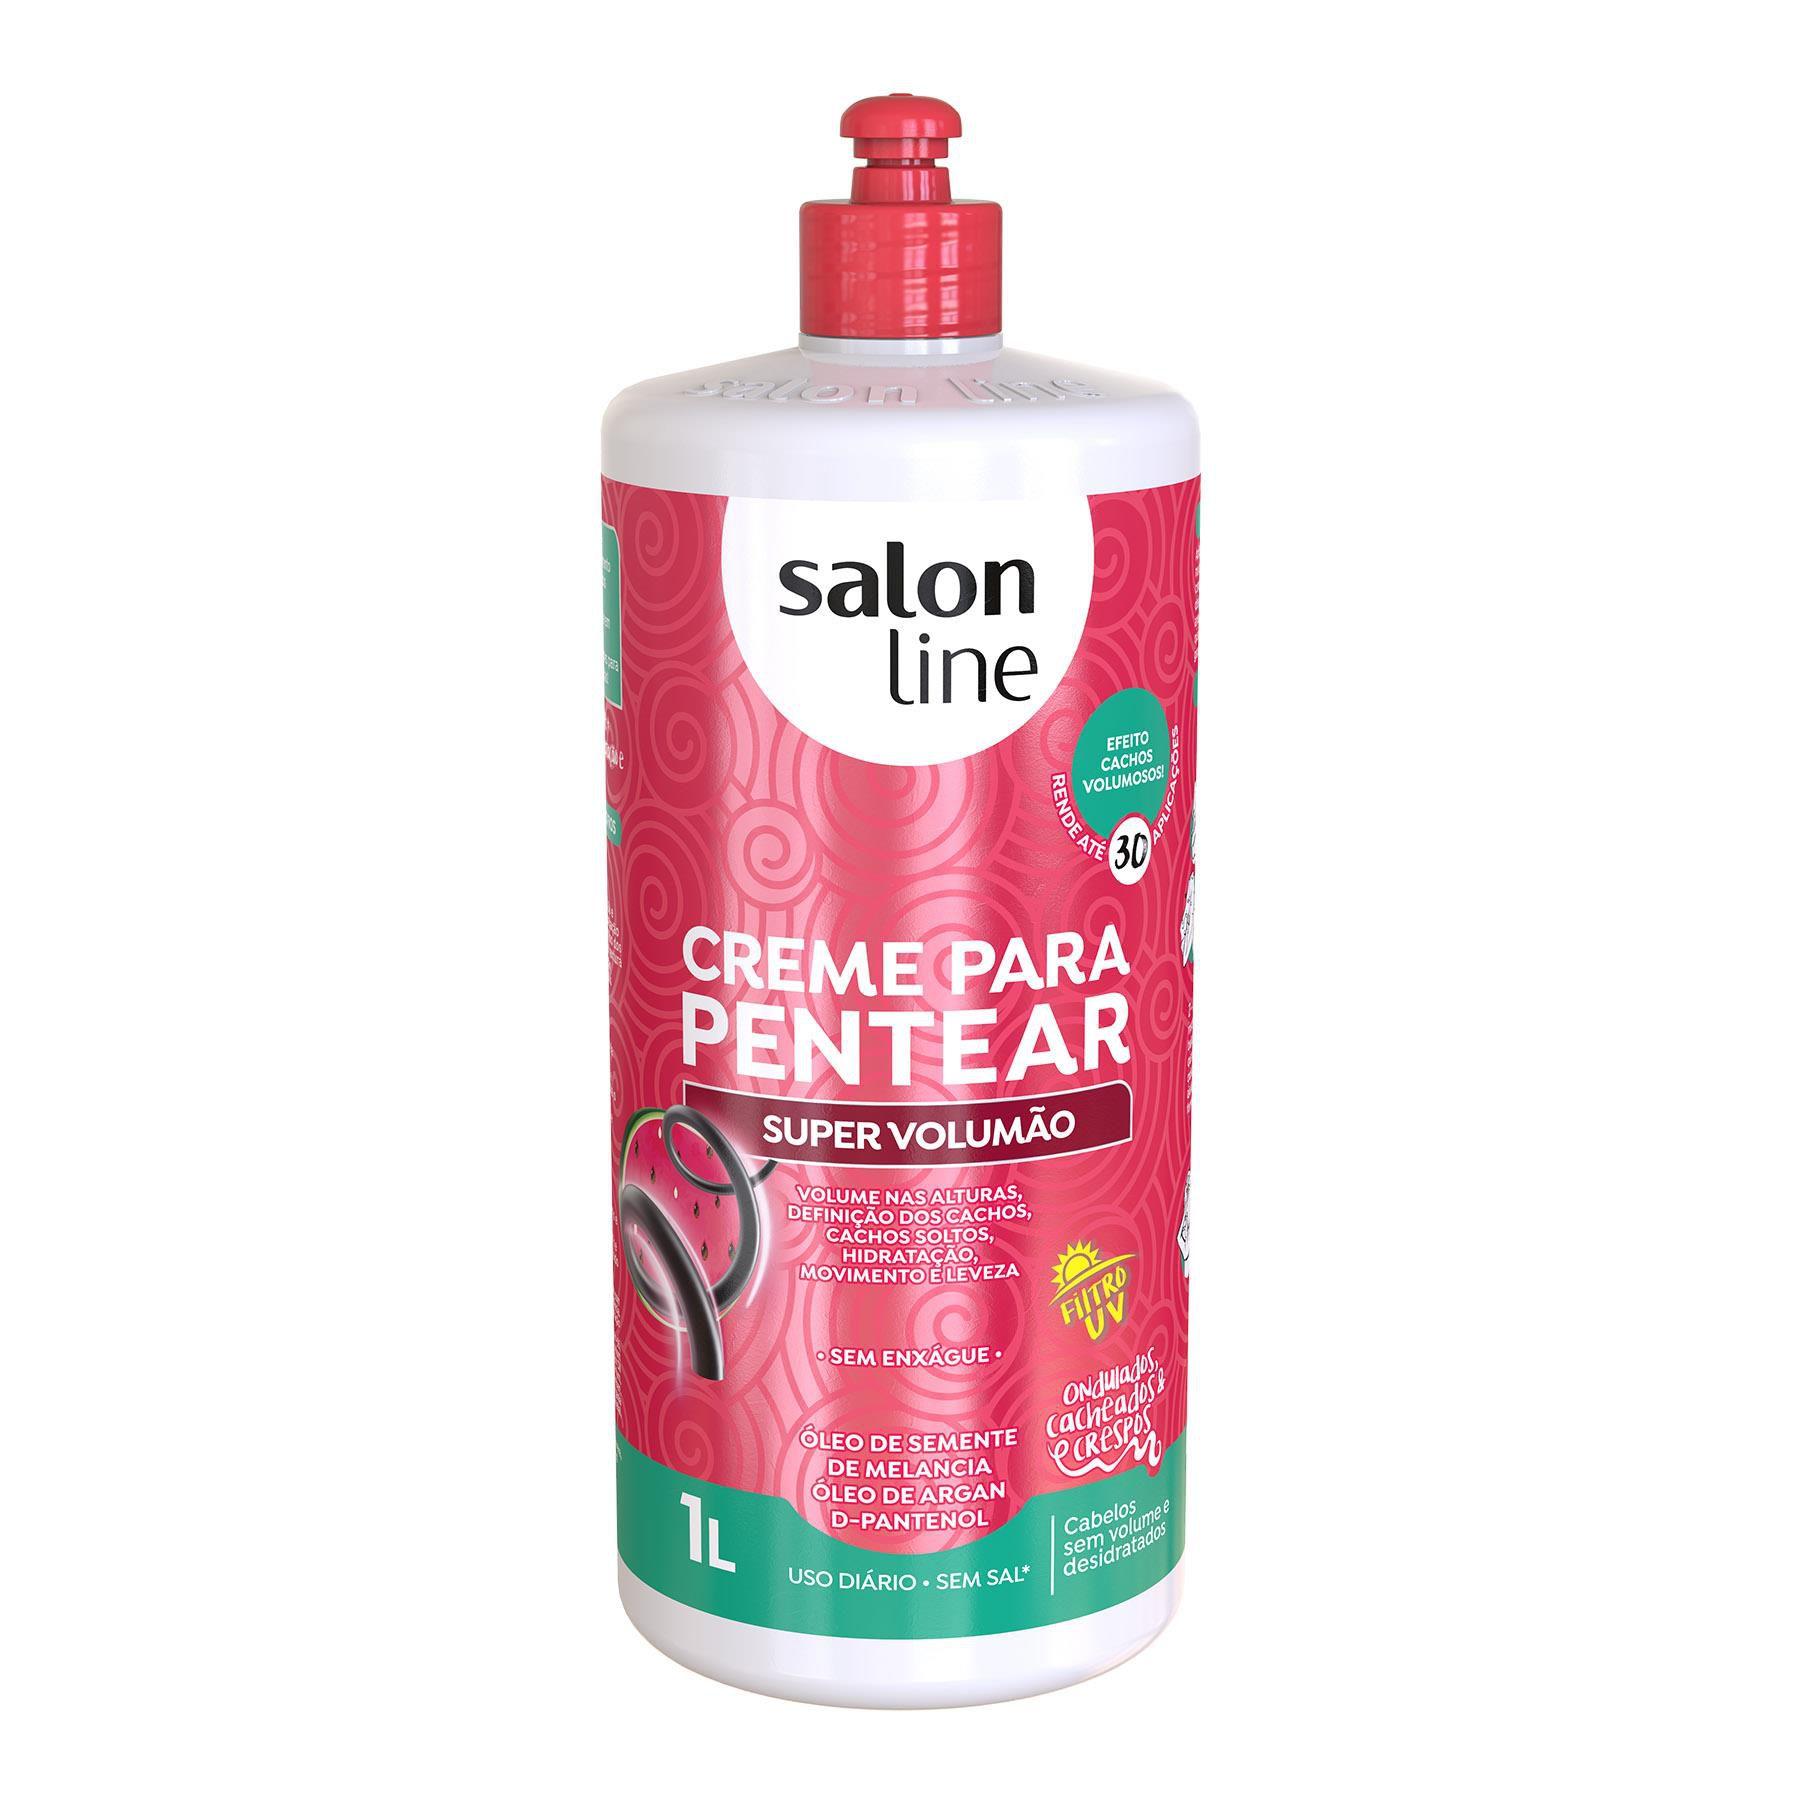 Salon Line Creme para Pentear Super Volumão 1L